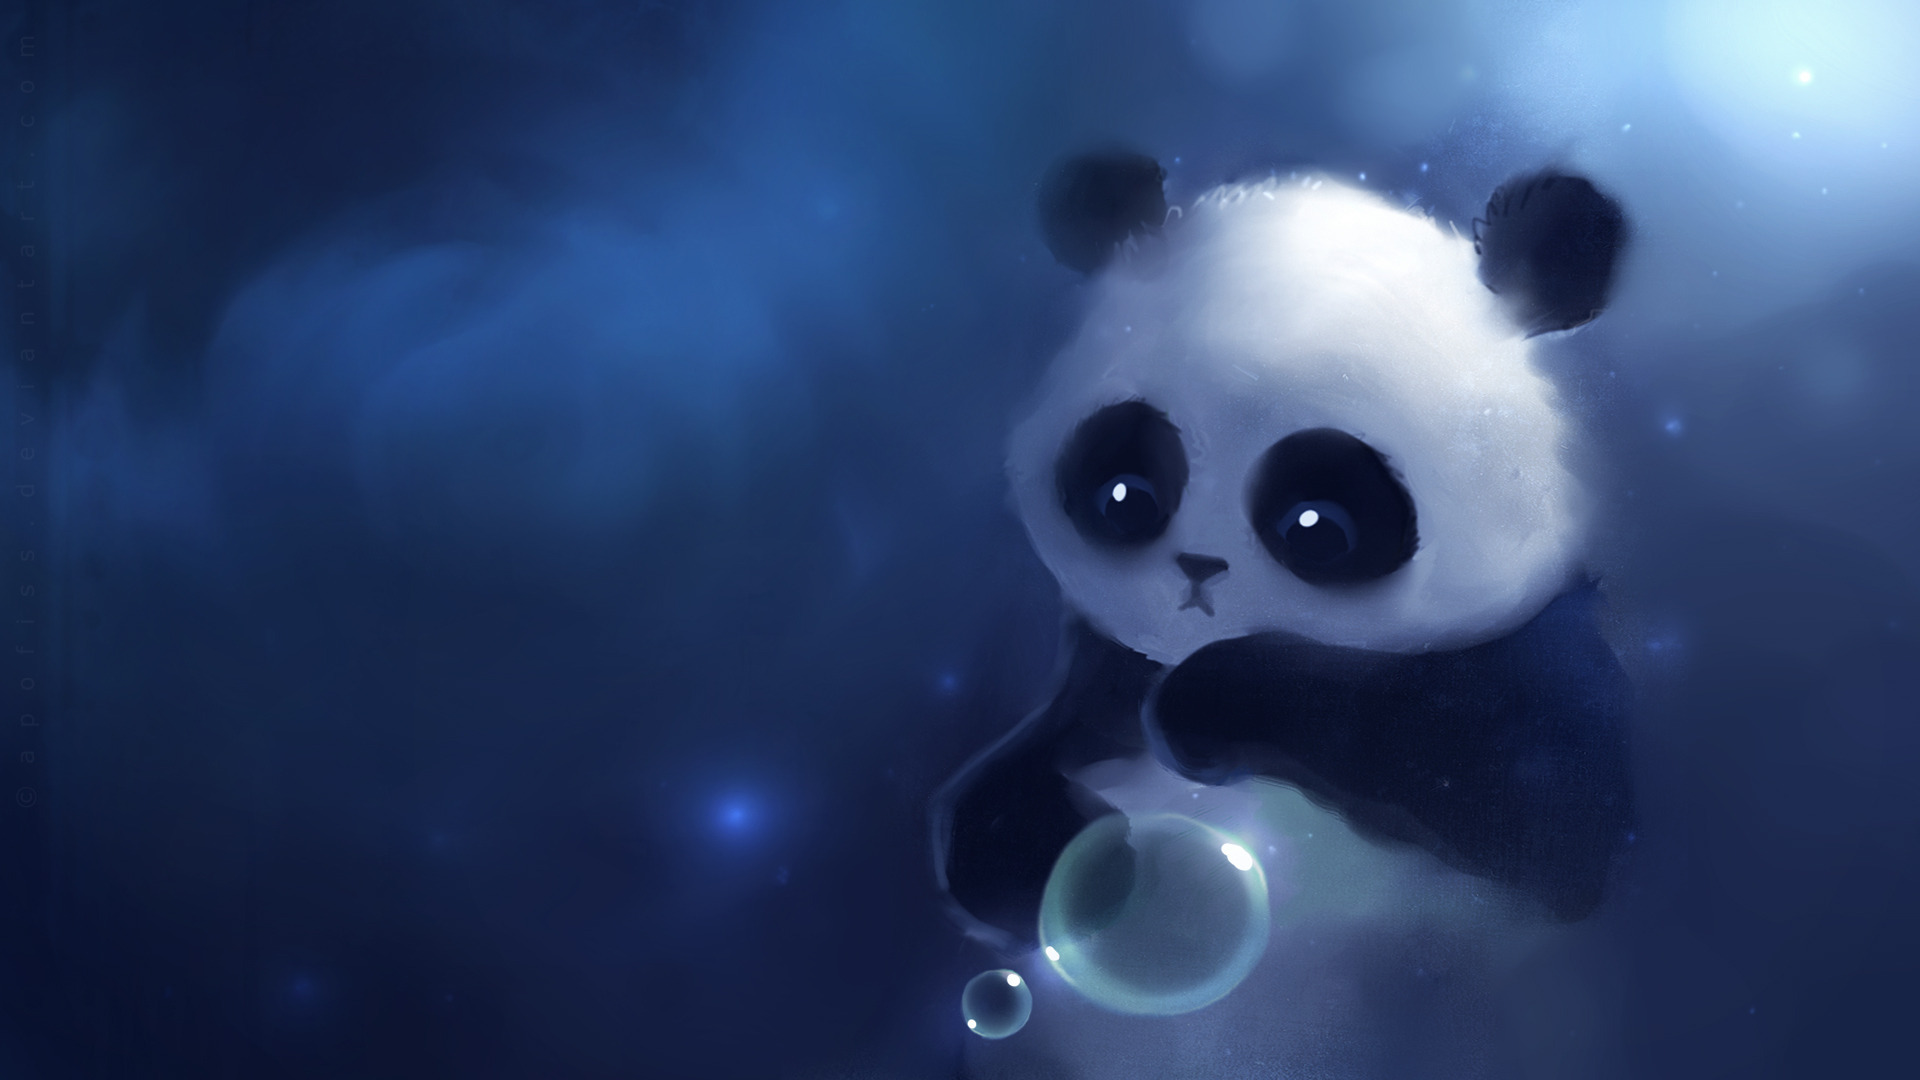 Cute Panda Animals Wallpapers 4442 Wallpaper Cool Walldiskpapercom 1920x1080